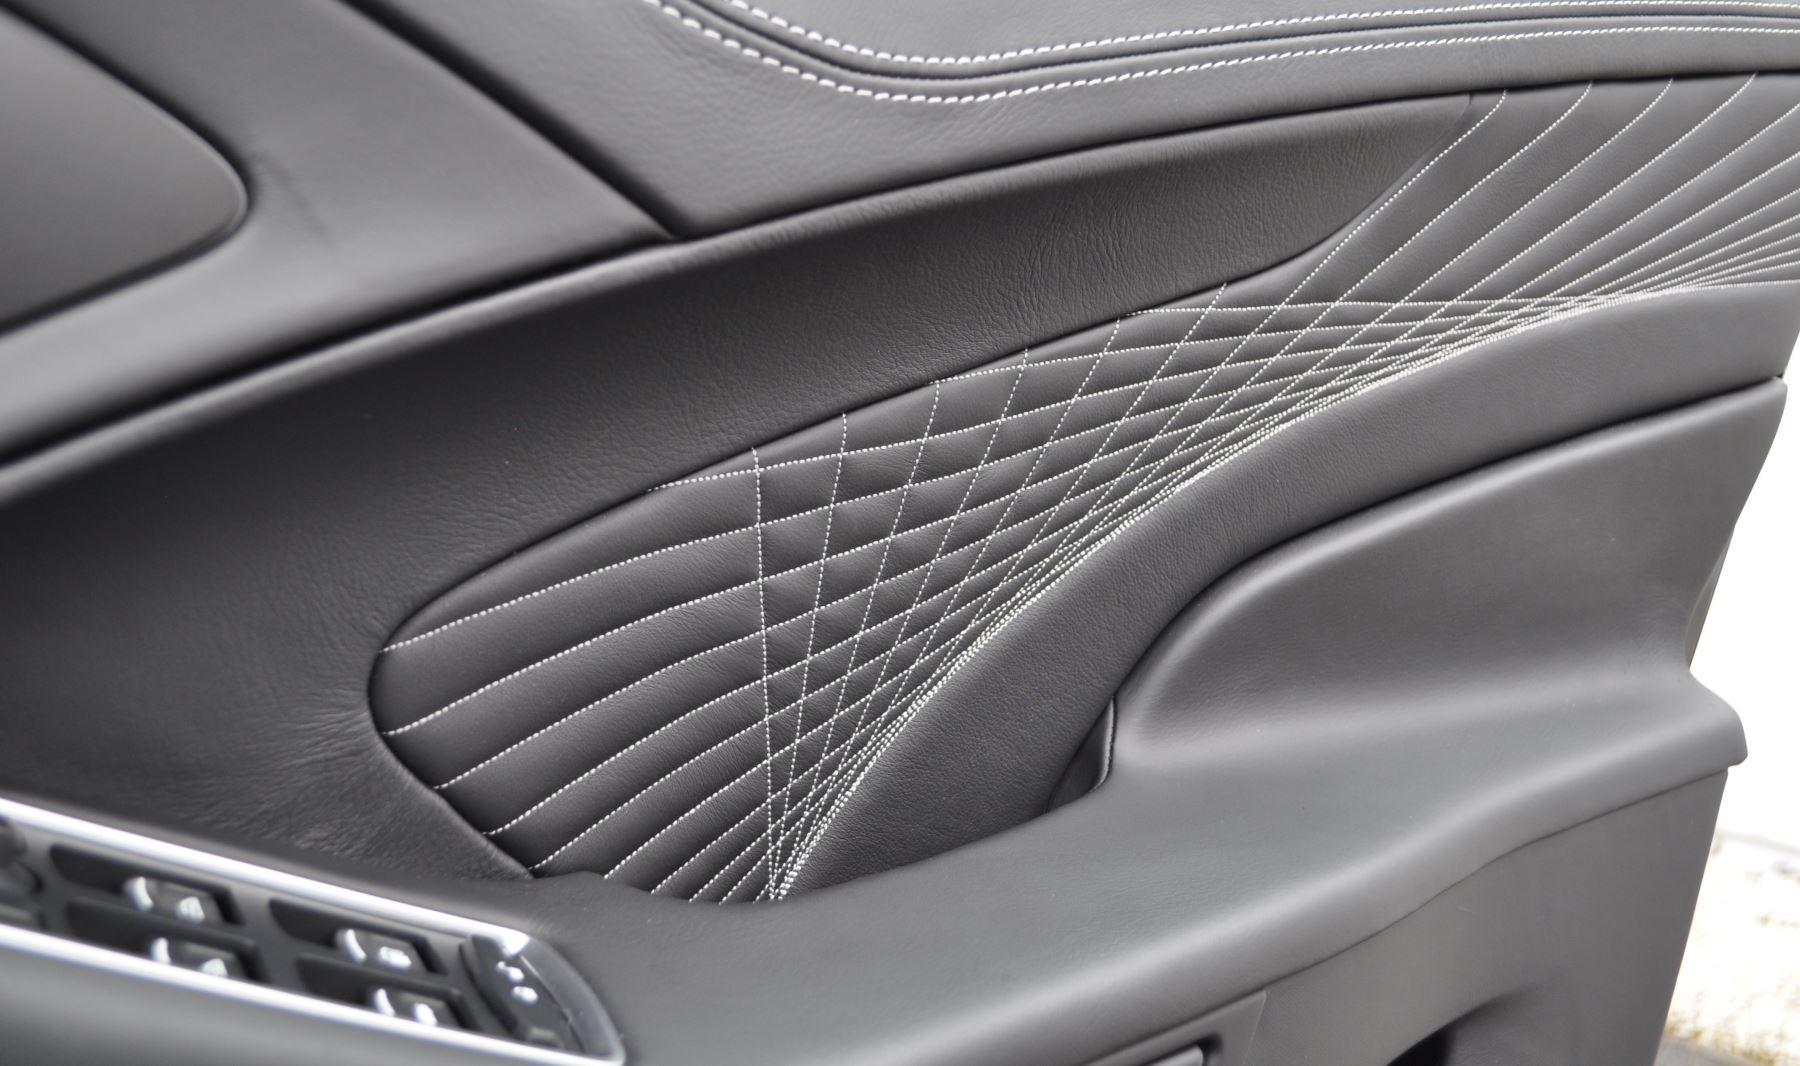 Aston Martin Vanquish S V12 [595] S 2+2 2dr Touchtronic image 29